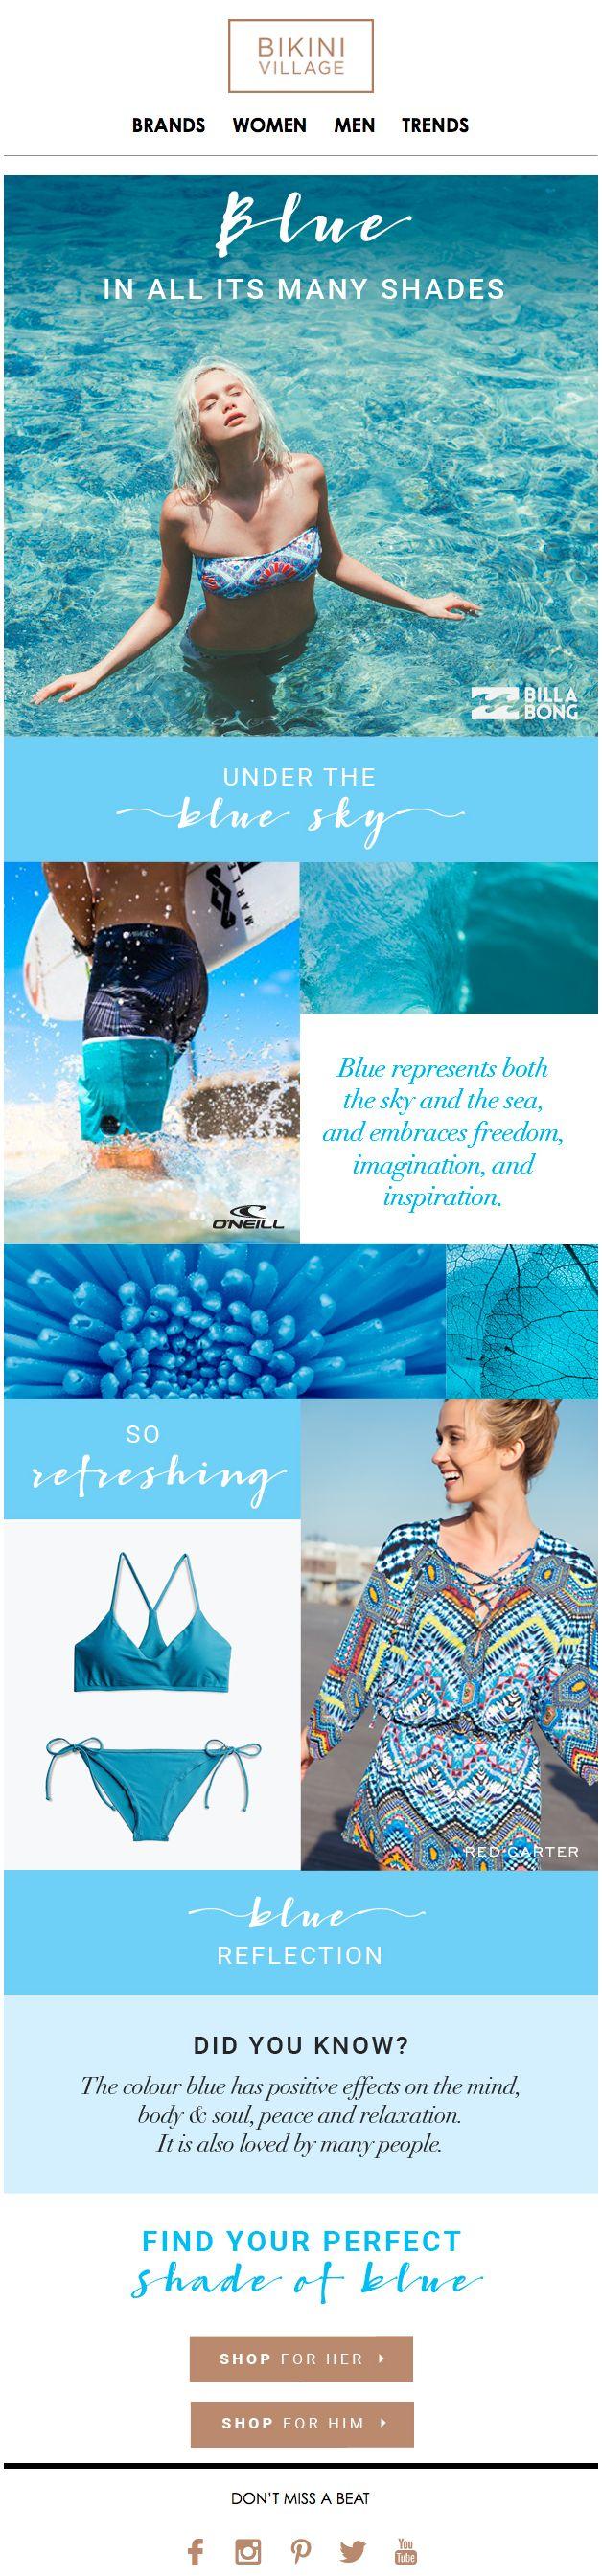 Colour specific content style email design from Bikini Village